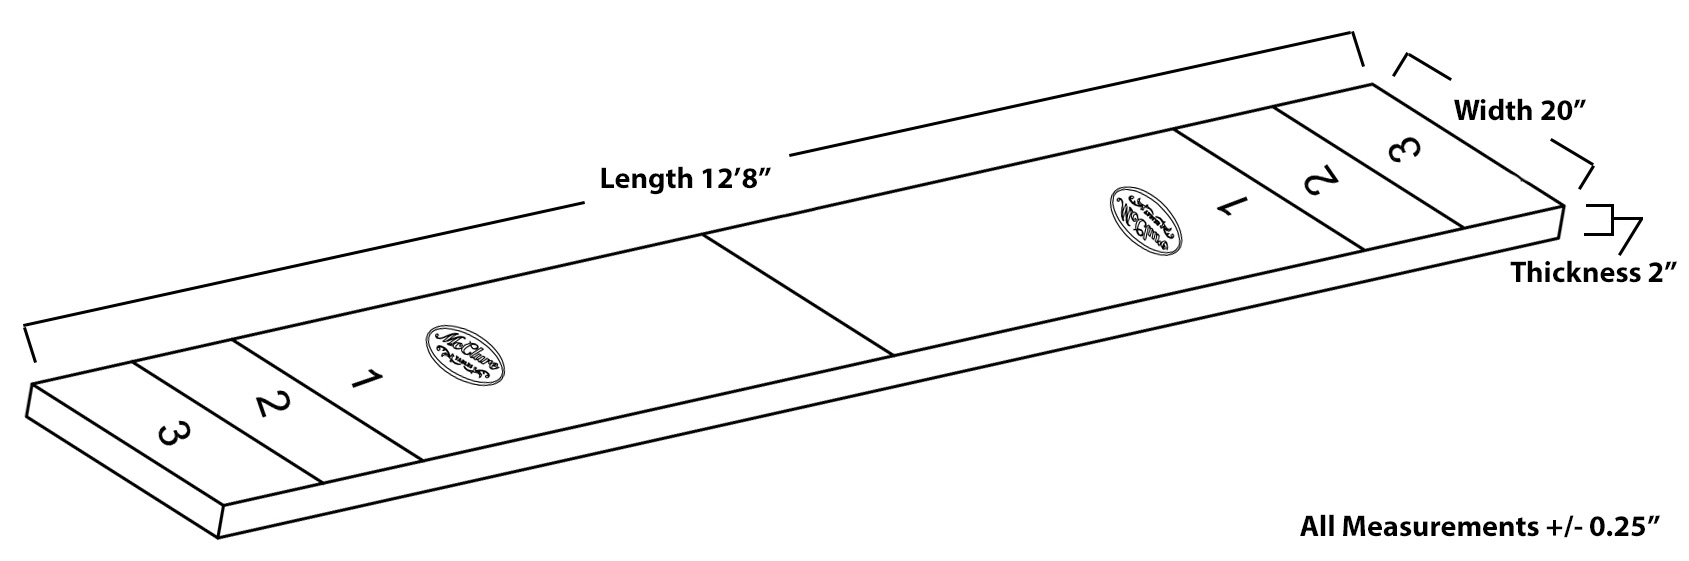 14 foot harvard shuffleboard table mcclure tables